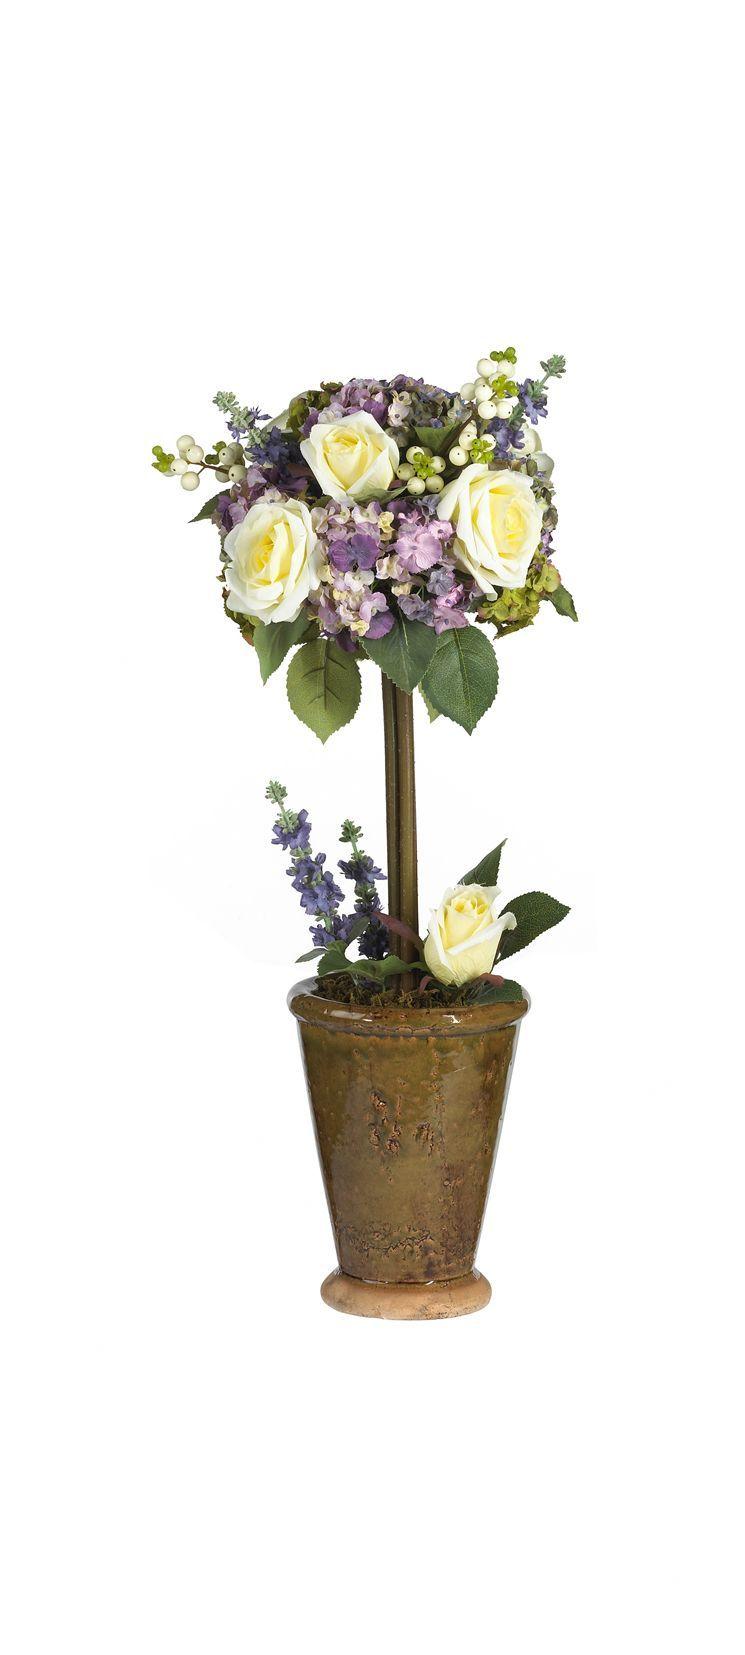 Hydrangea Rose Silk Flower Arrangement Topiary In Planter